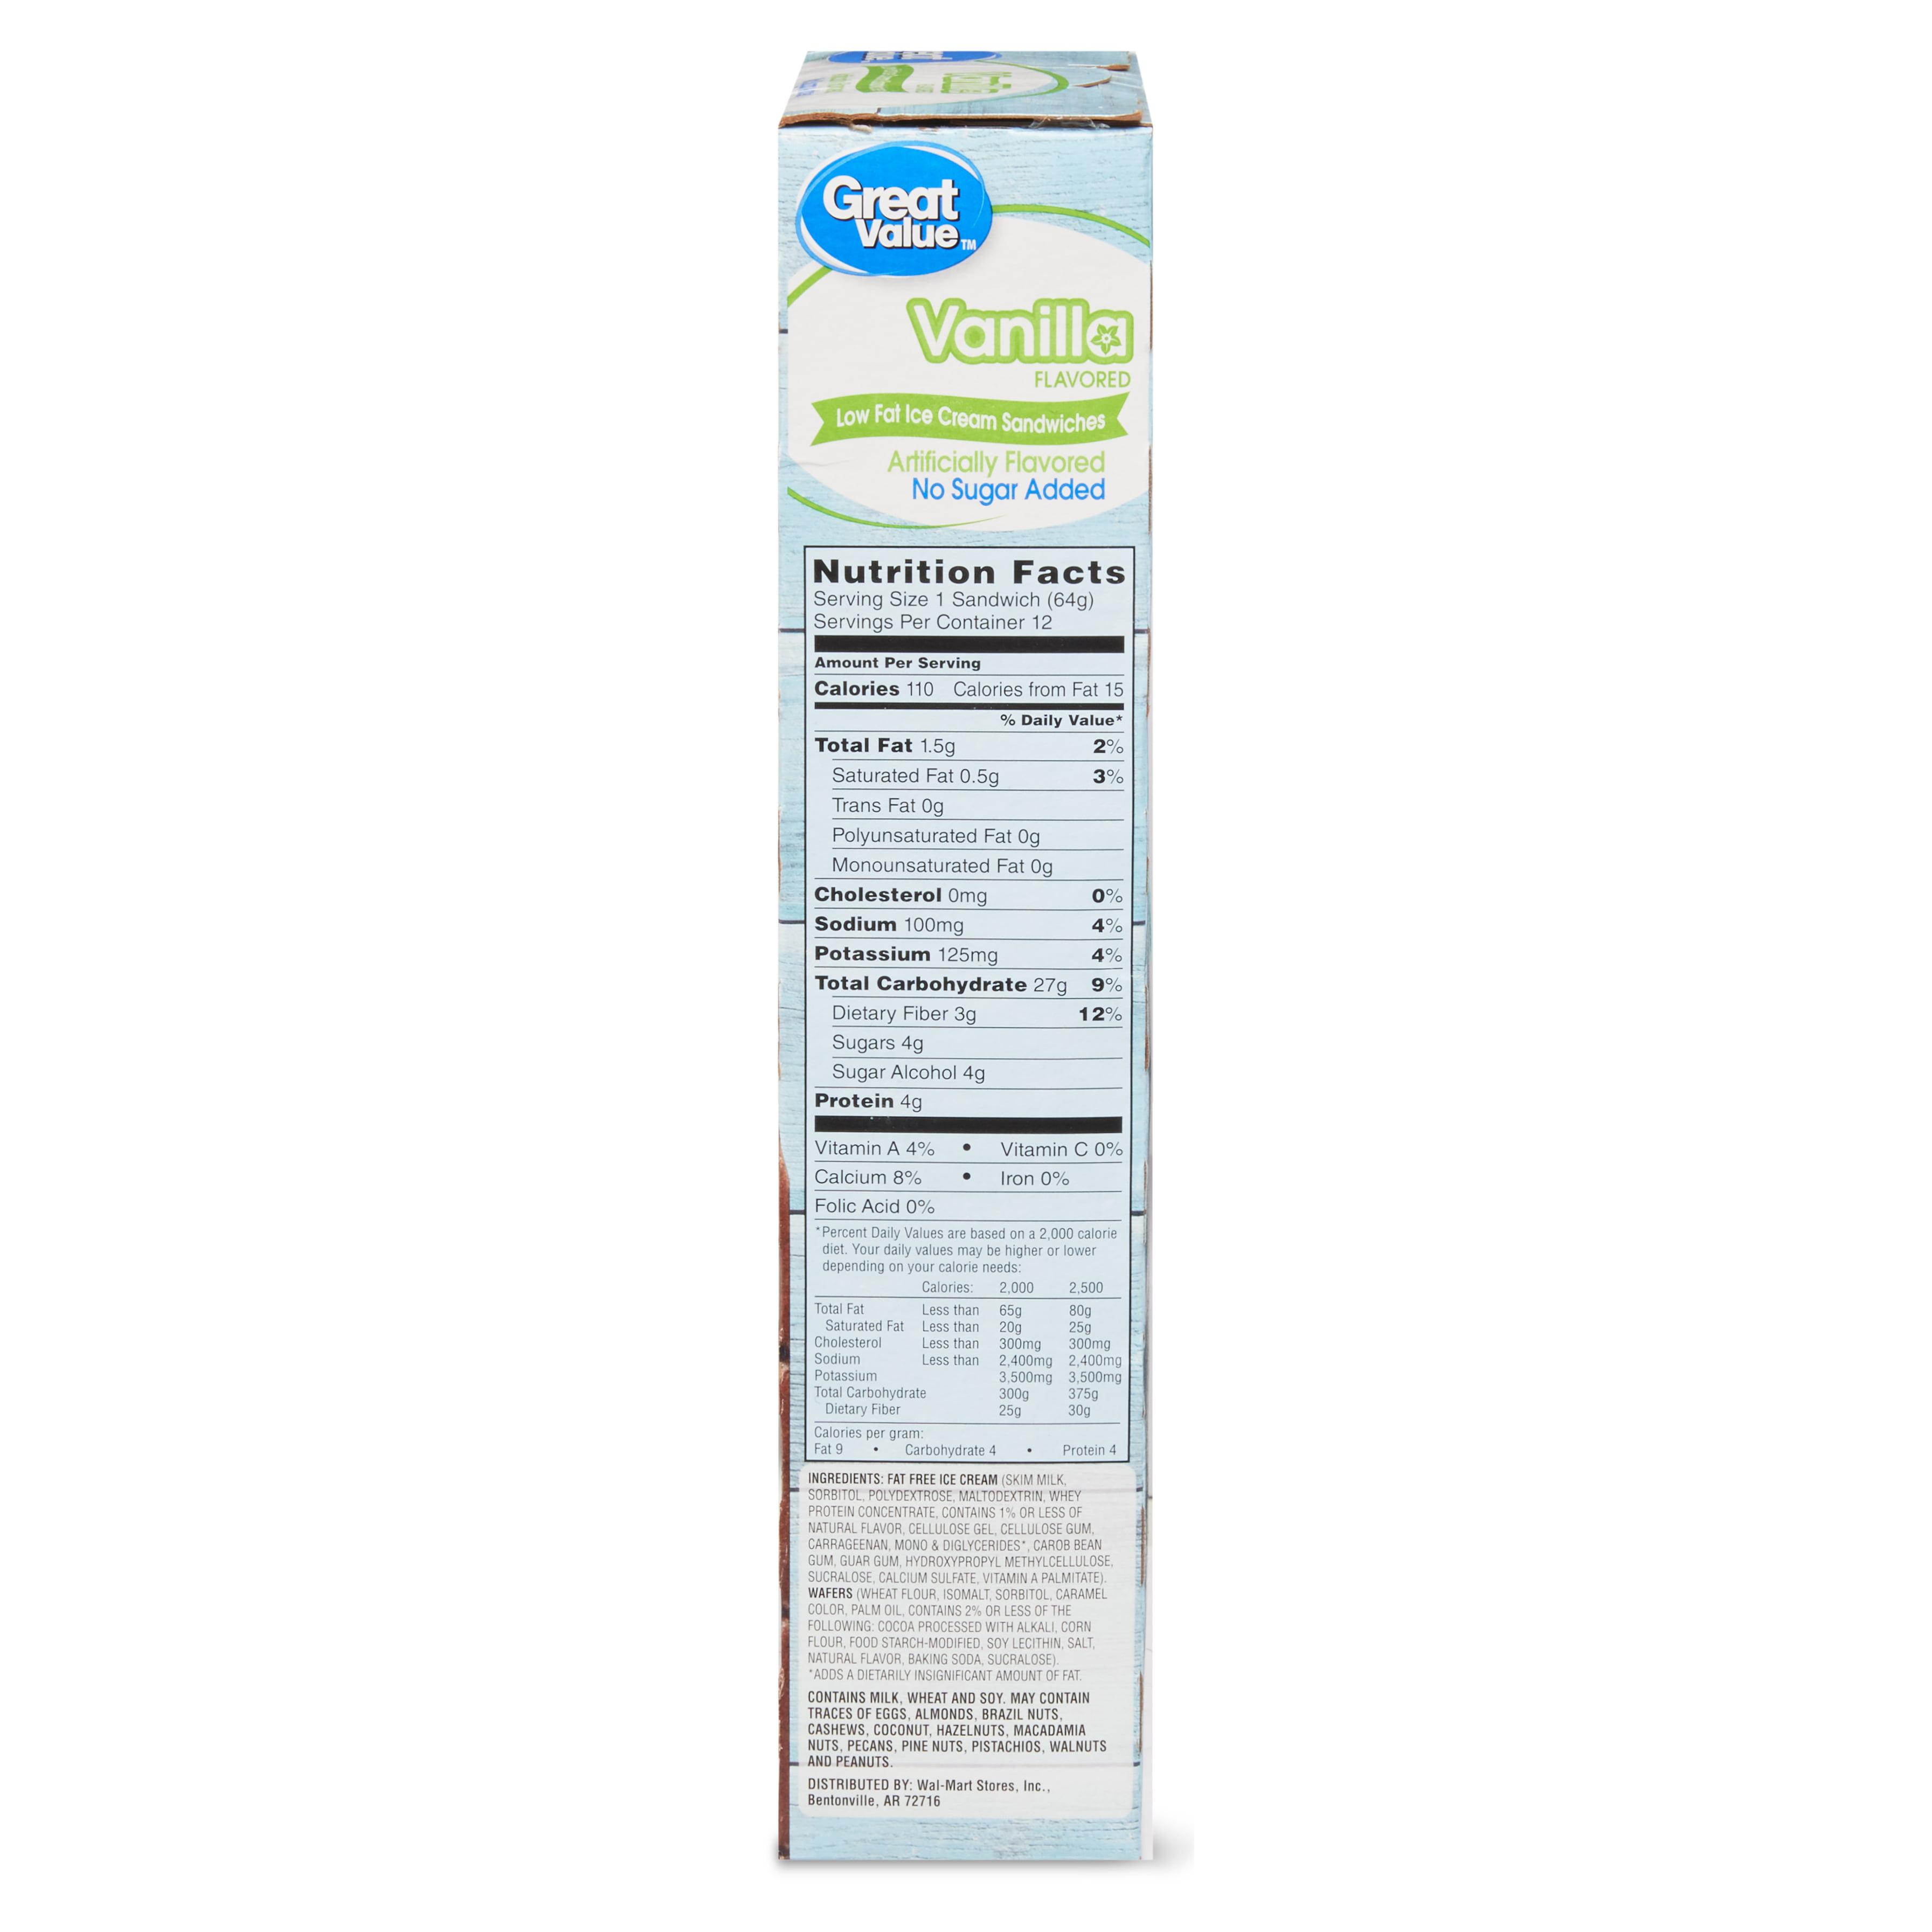 Great Value Vanilla Flavored Low Fat Ice Cream Sandwiches, 42 oz, 12 Count